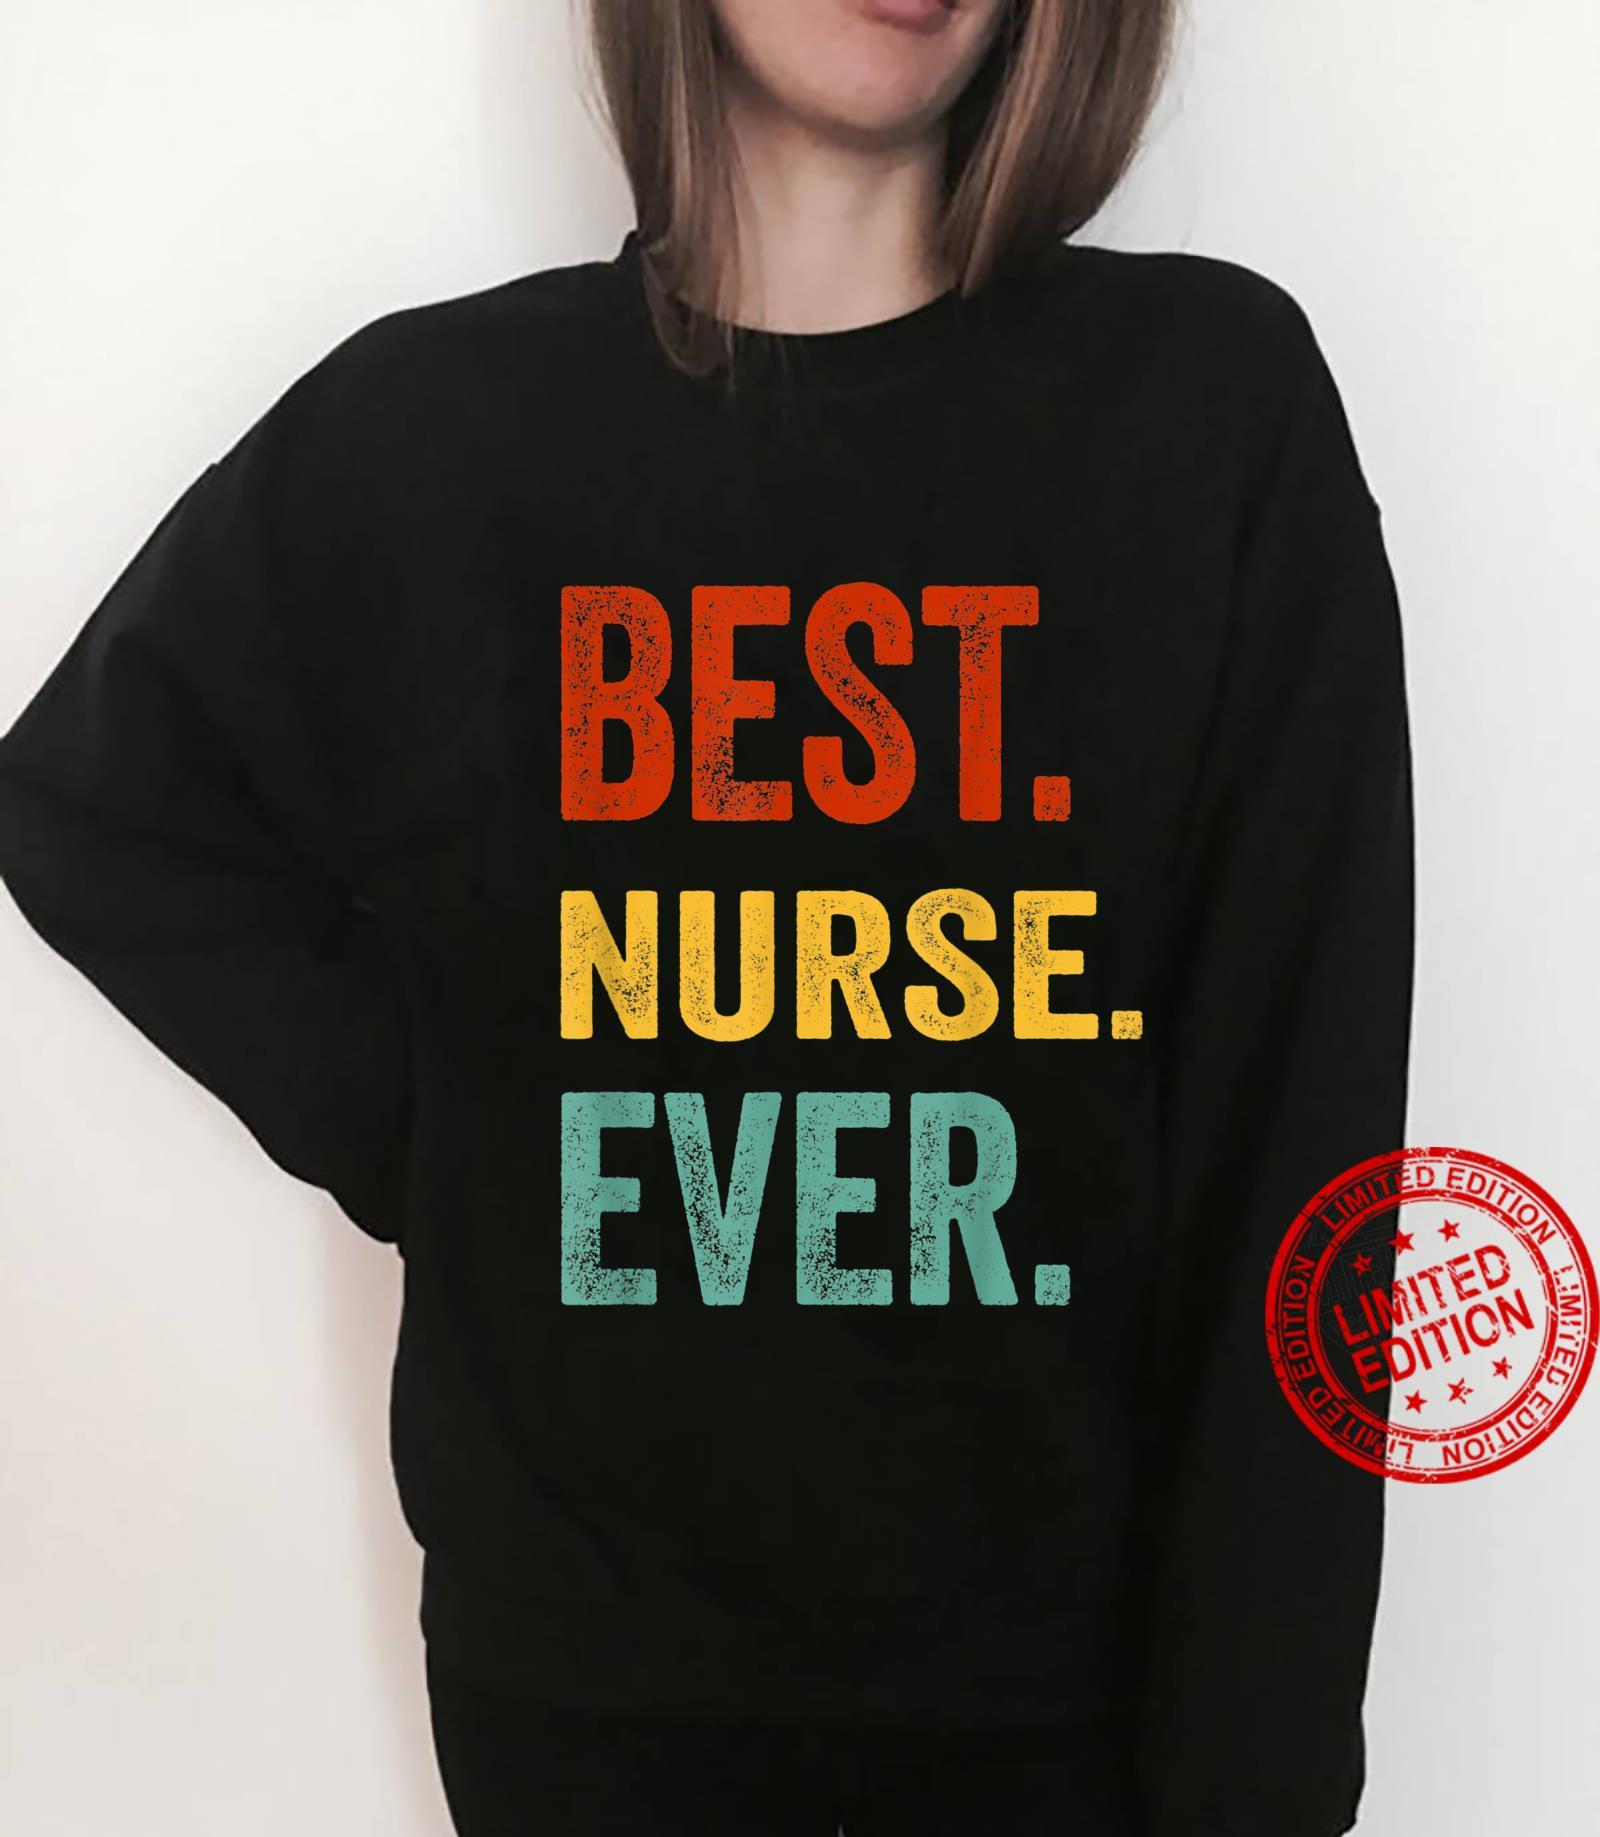 Best Nurse Ever Hospital Staff Nurse Doctor Appareal Shirt sweater